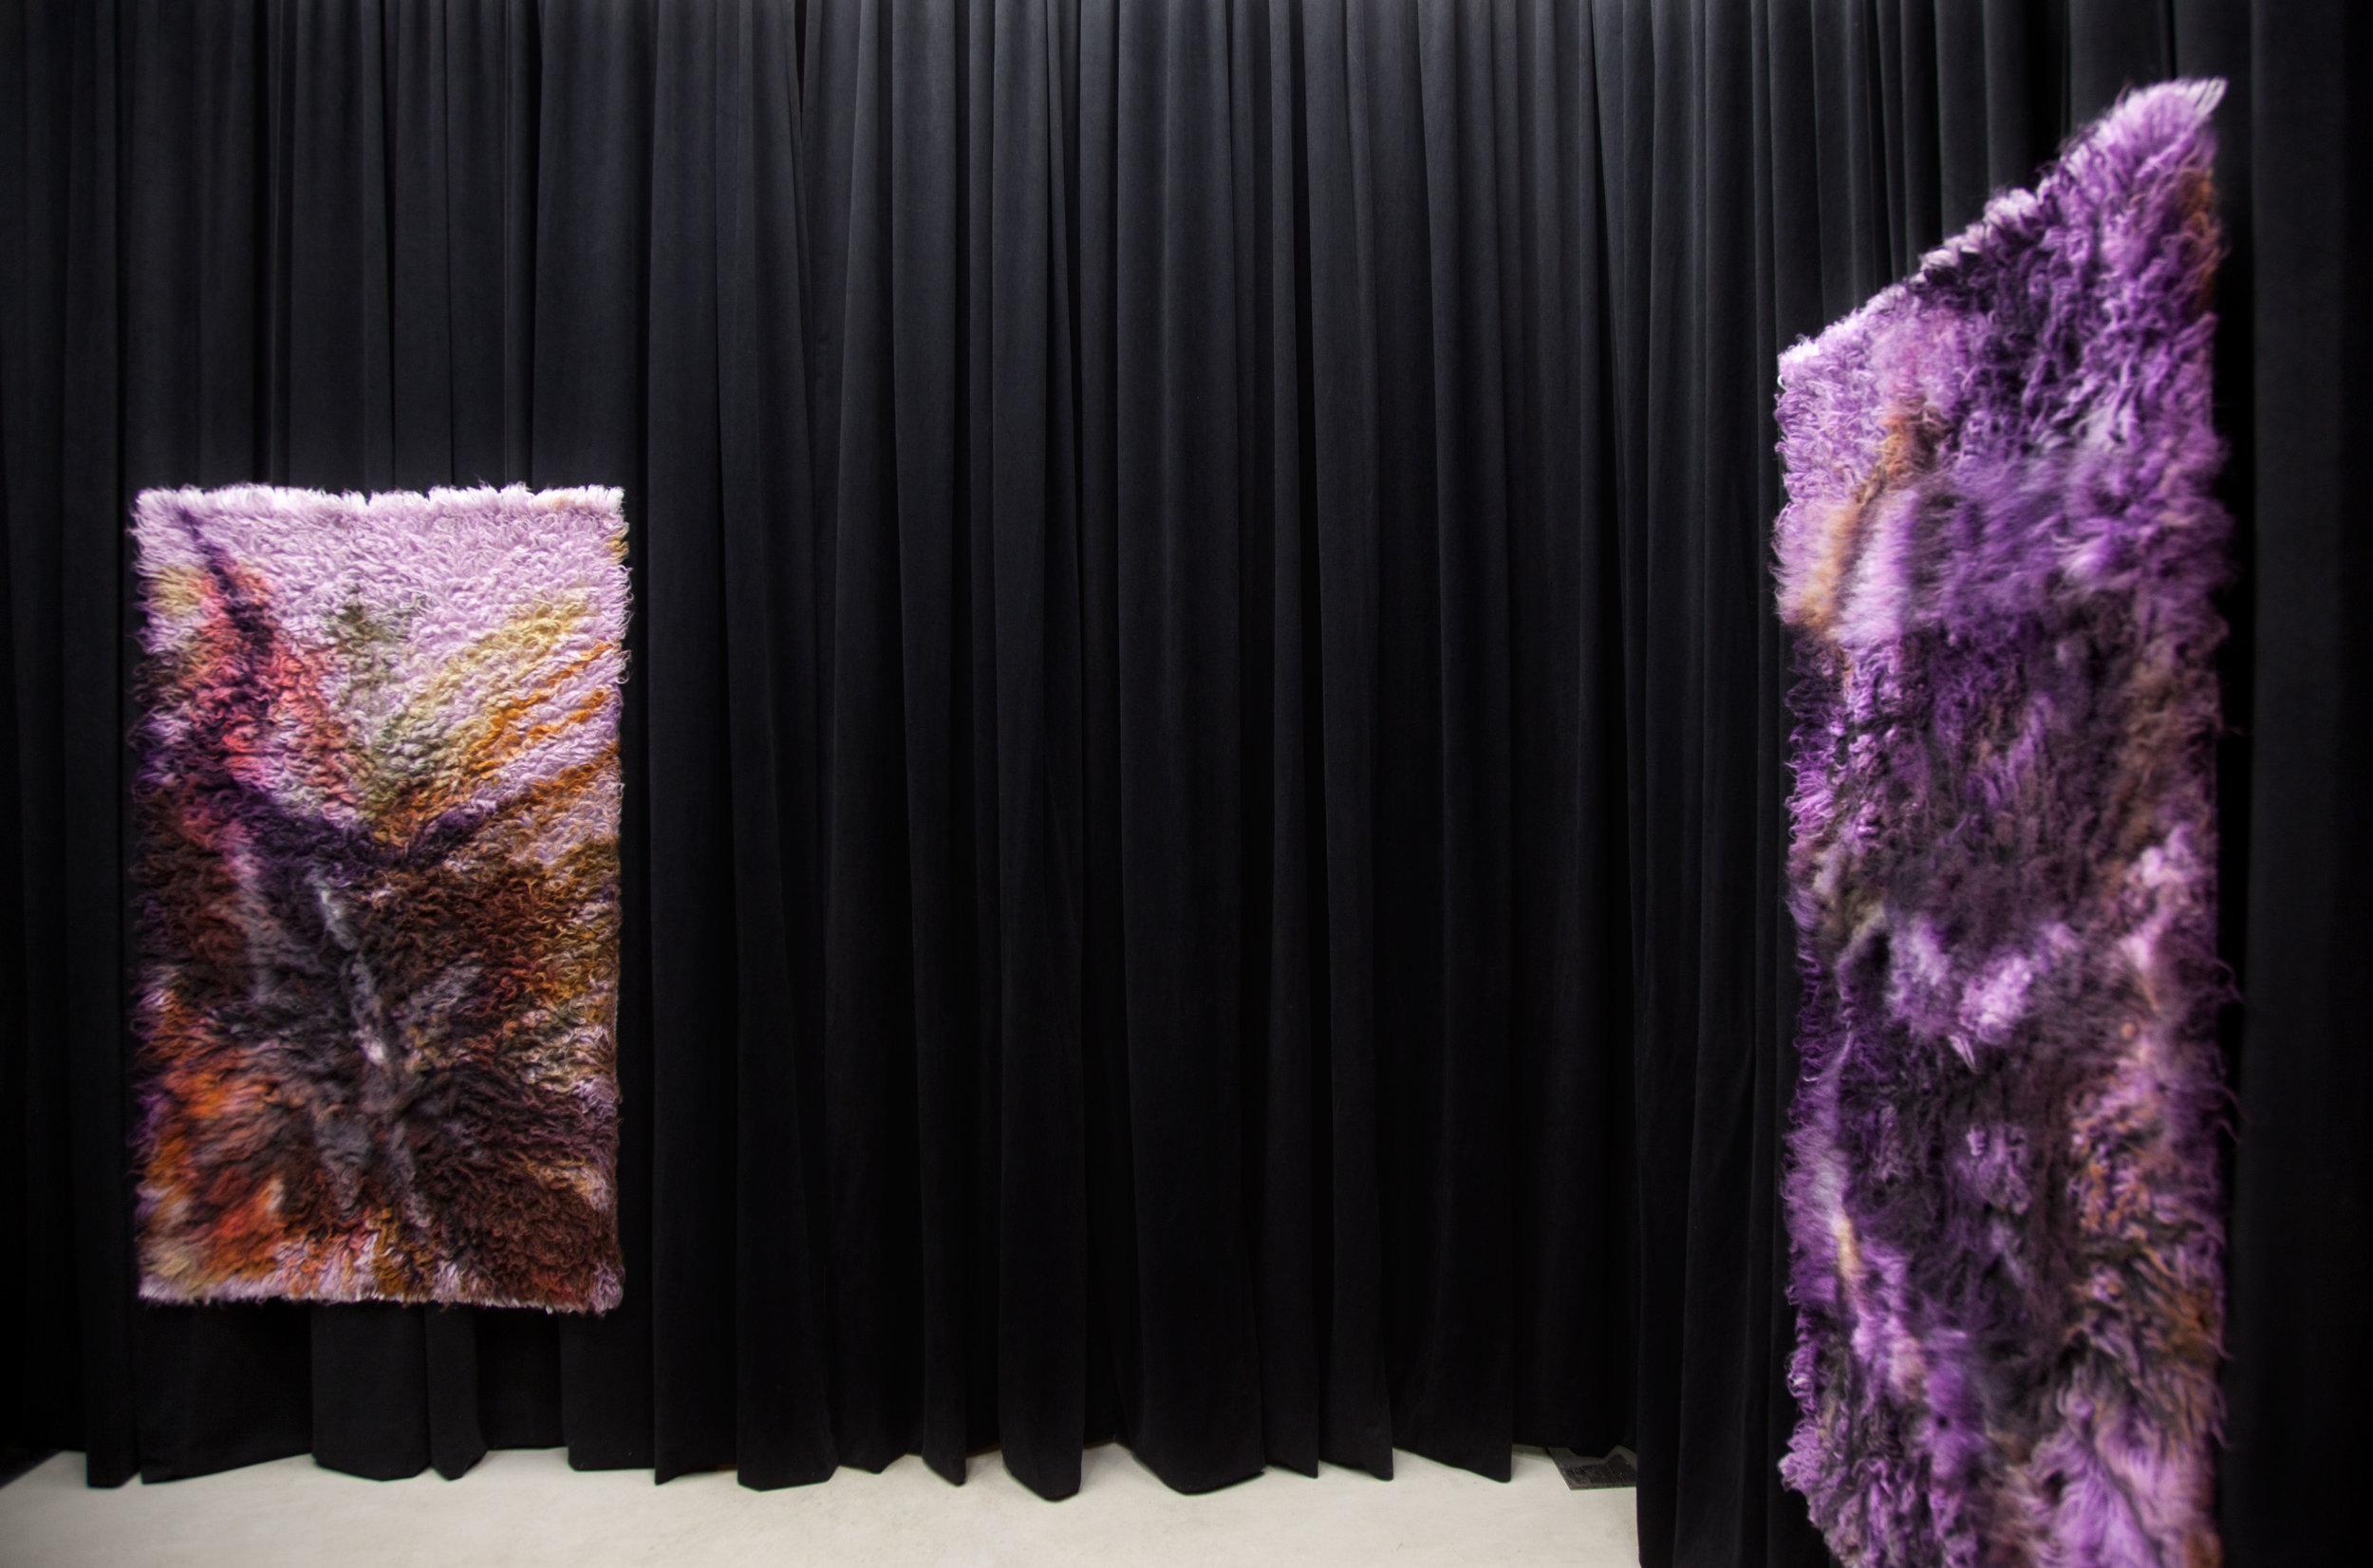 (Left)  Straw and Clay, 2017,  wool rug, acid dye, hairspray, chalk. (Right)  Iron and Steel, 2017, w ool rug, acid dye, hairspray, chalk.